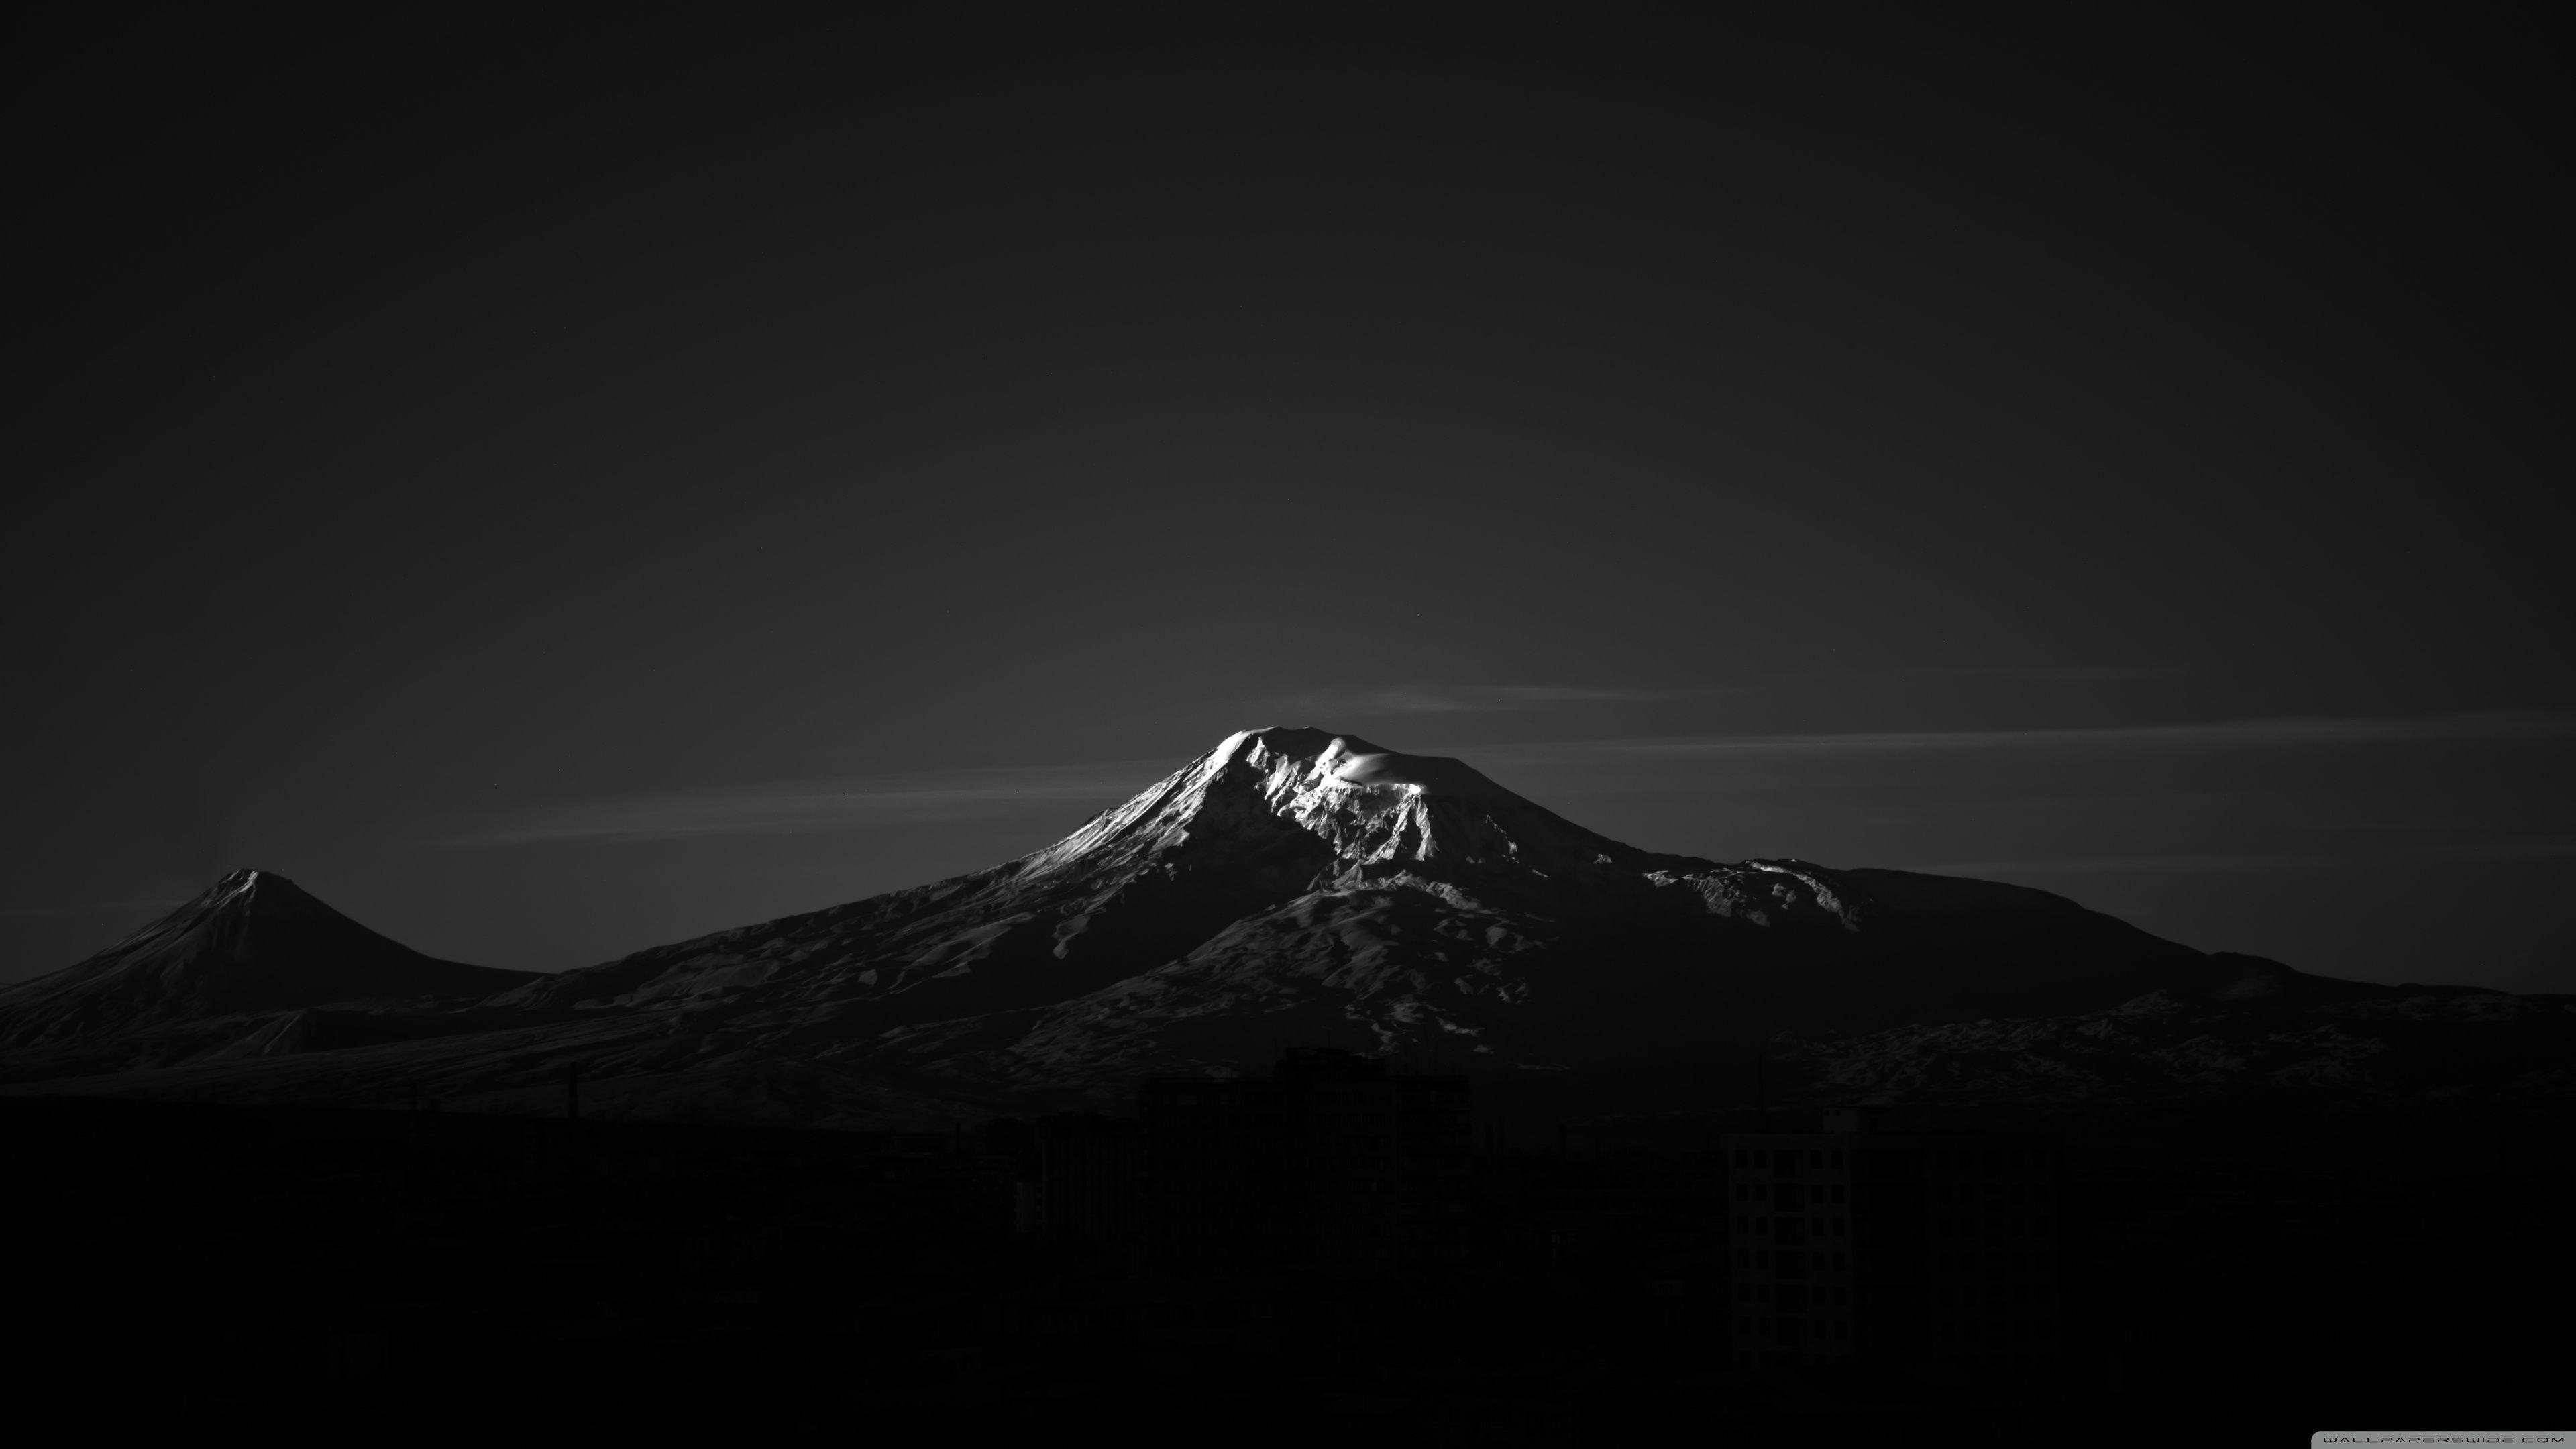 4K Black and White Wallpaper (48+ images)